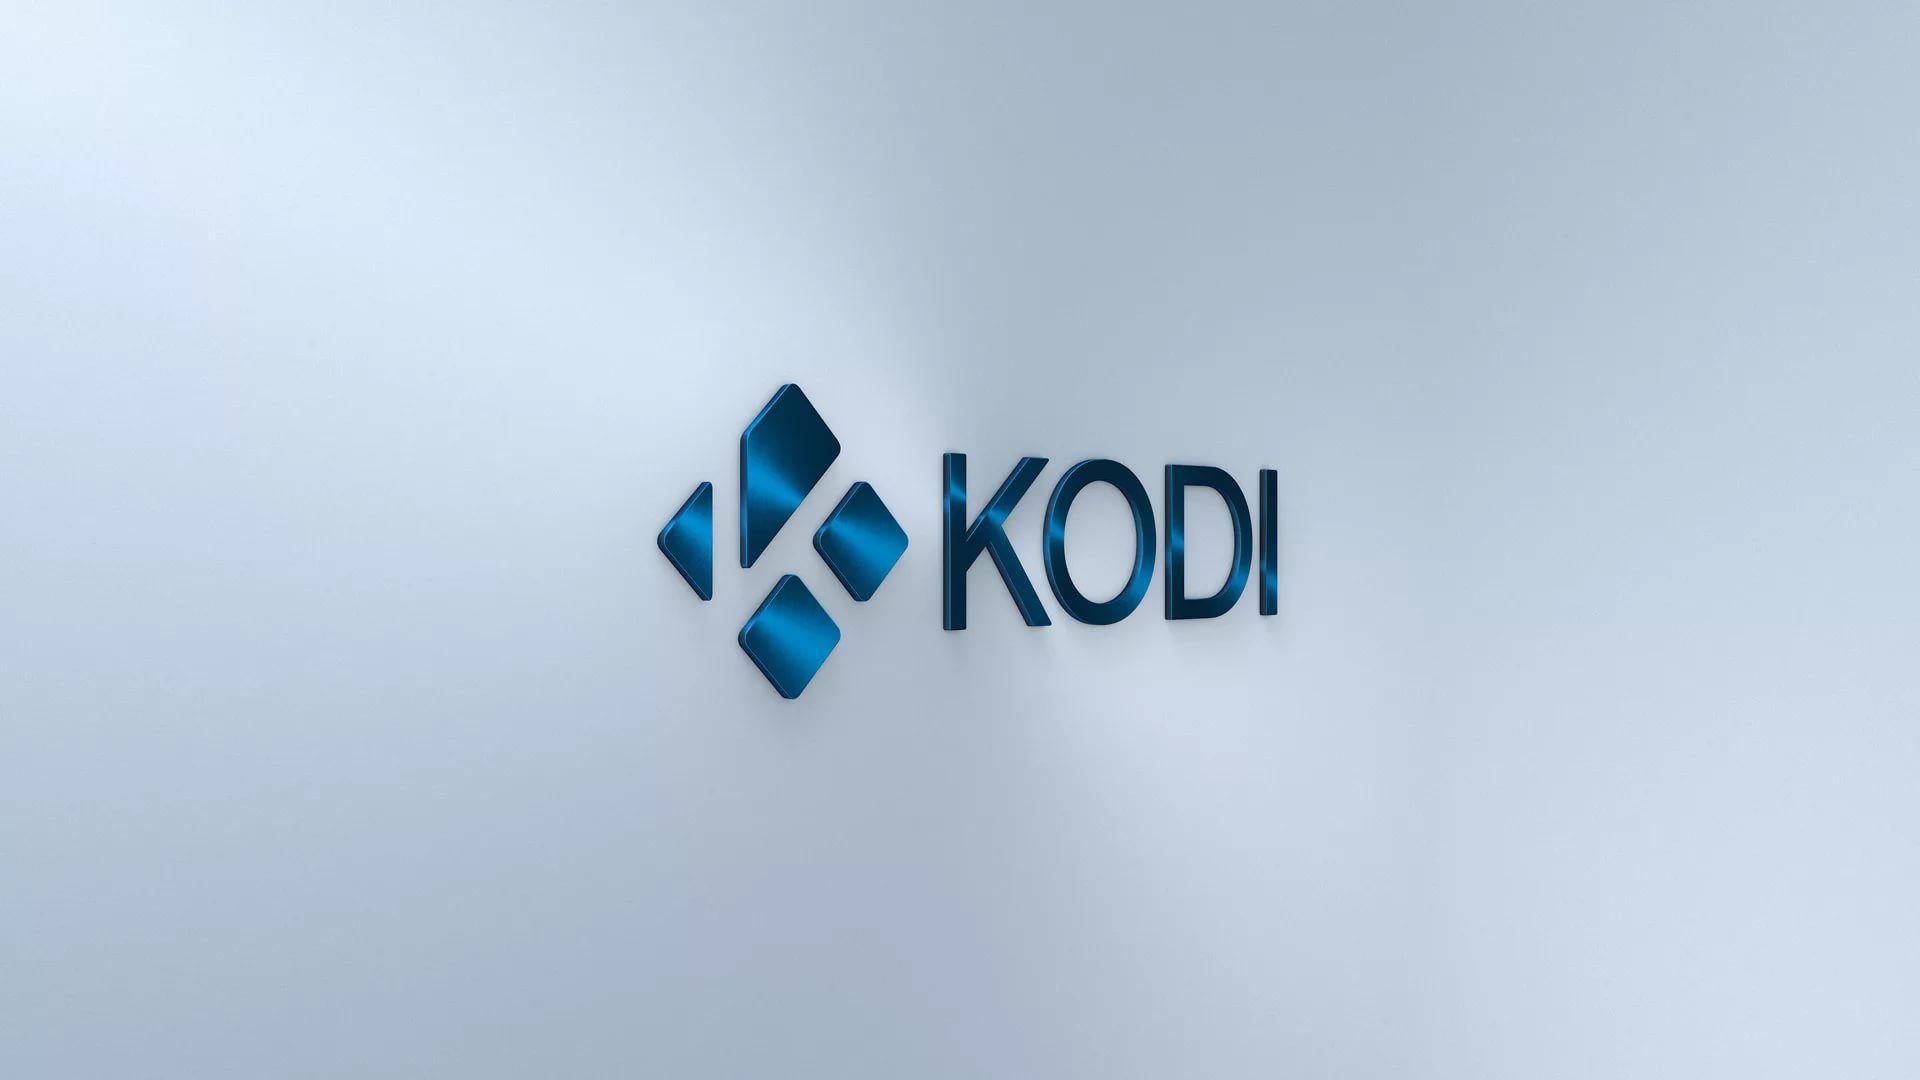 Kodi good wallpaper